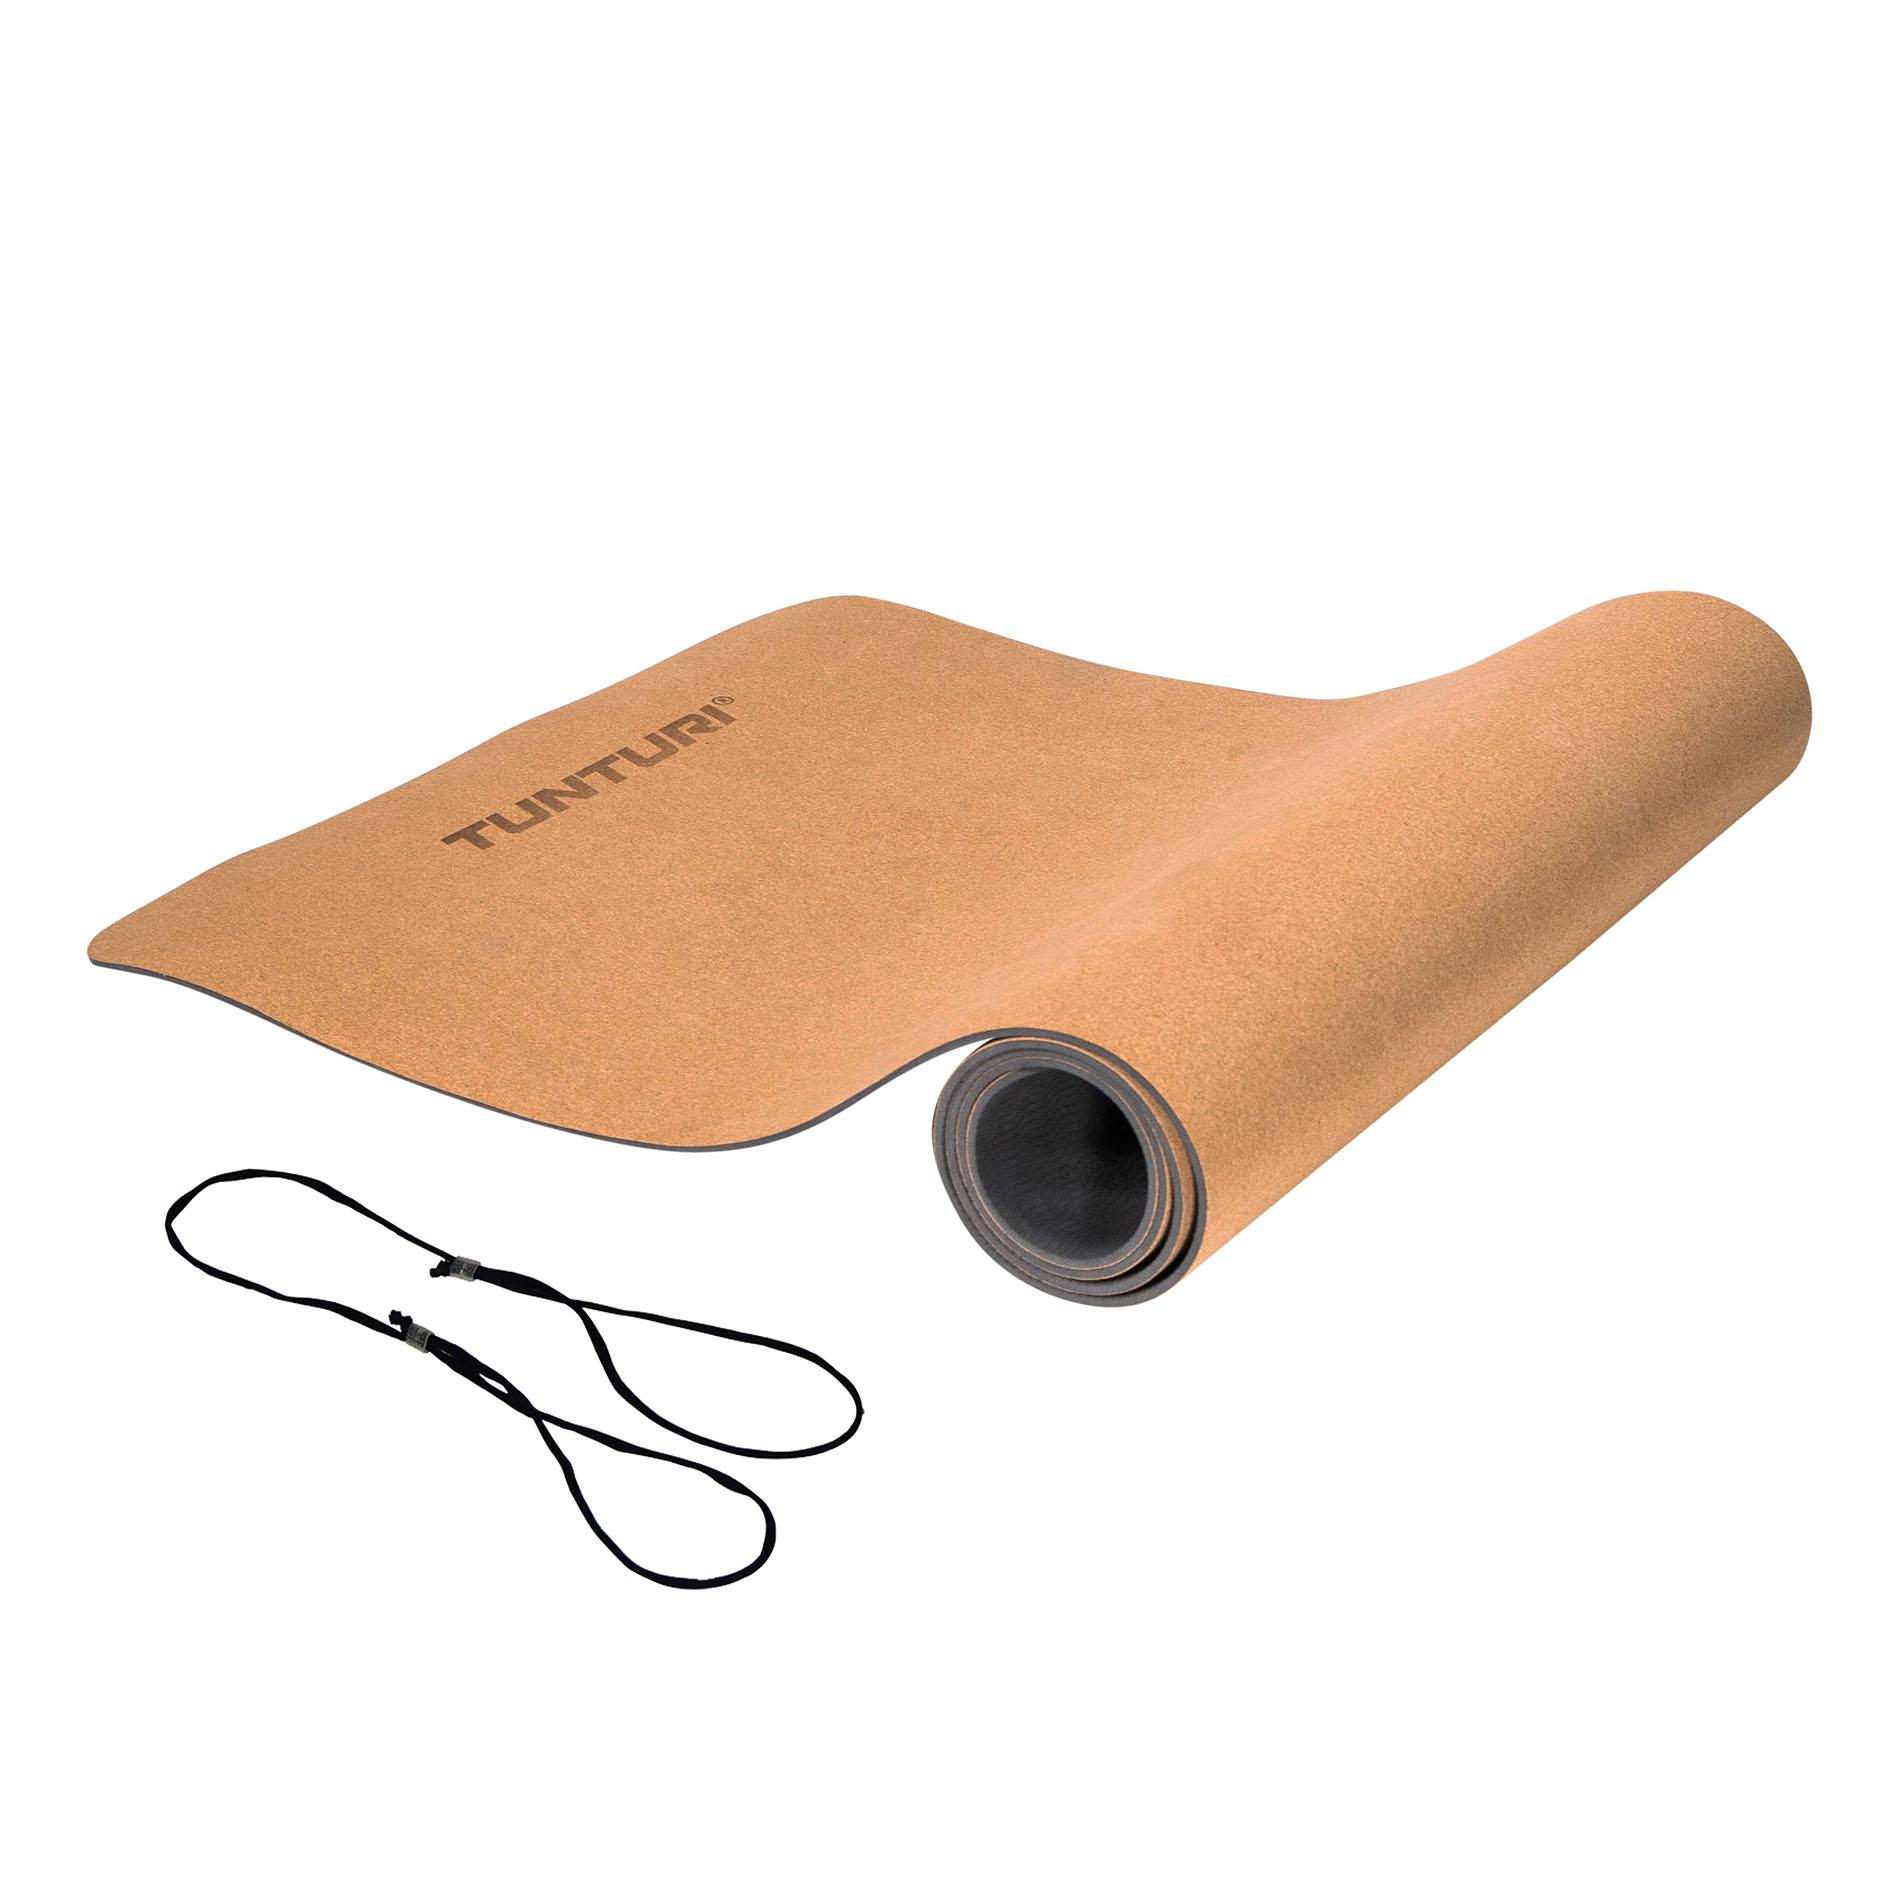 Cork TPE Yoga Mat